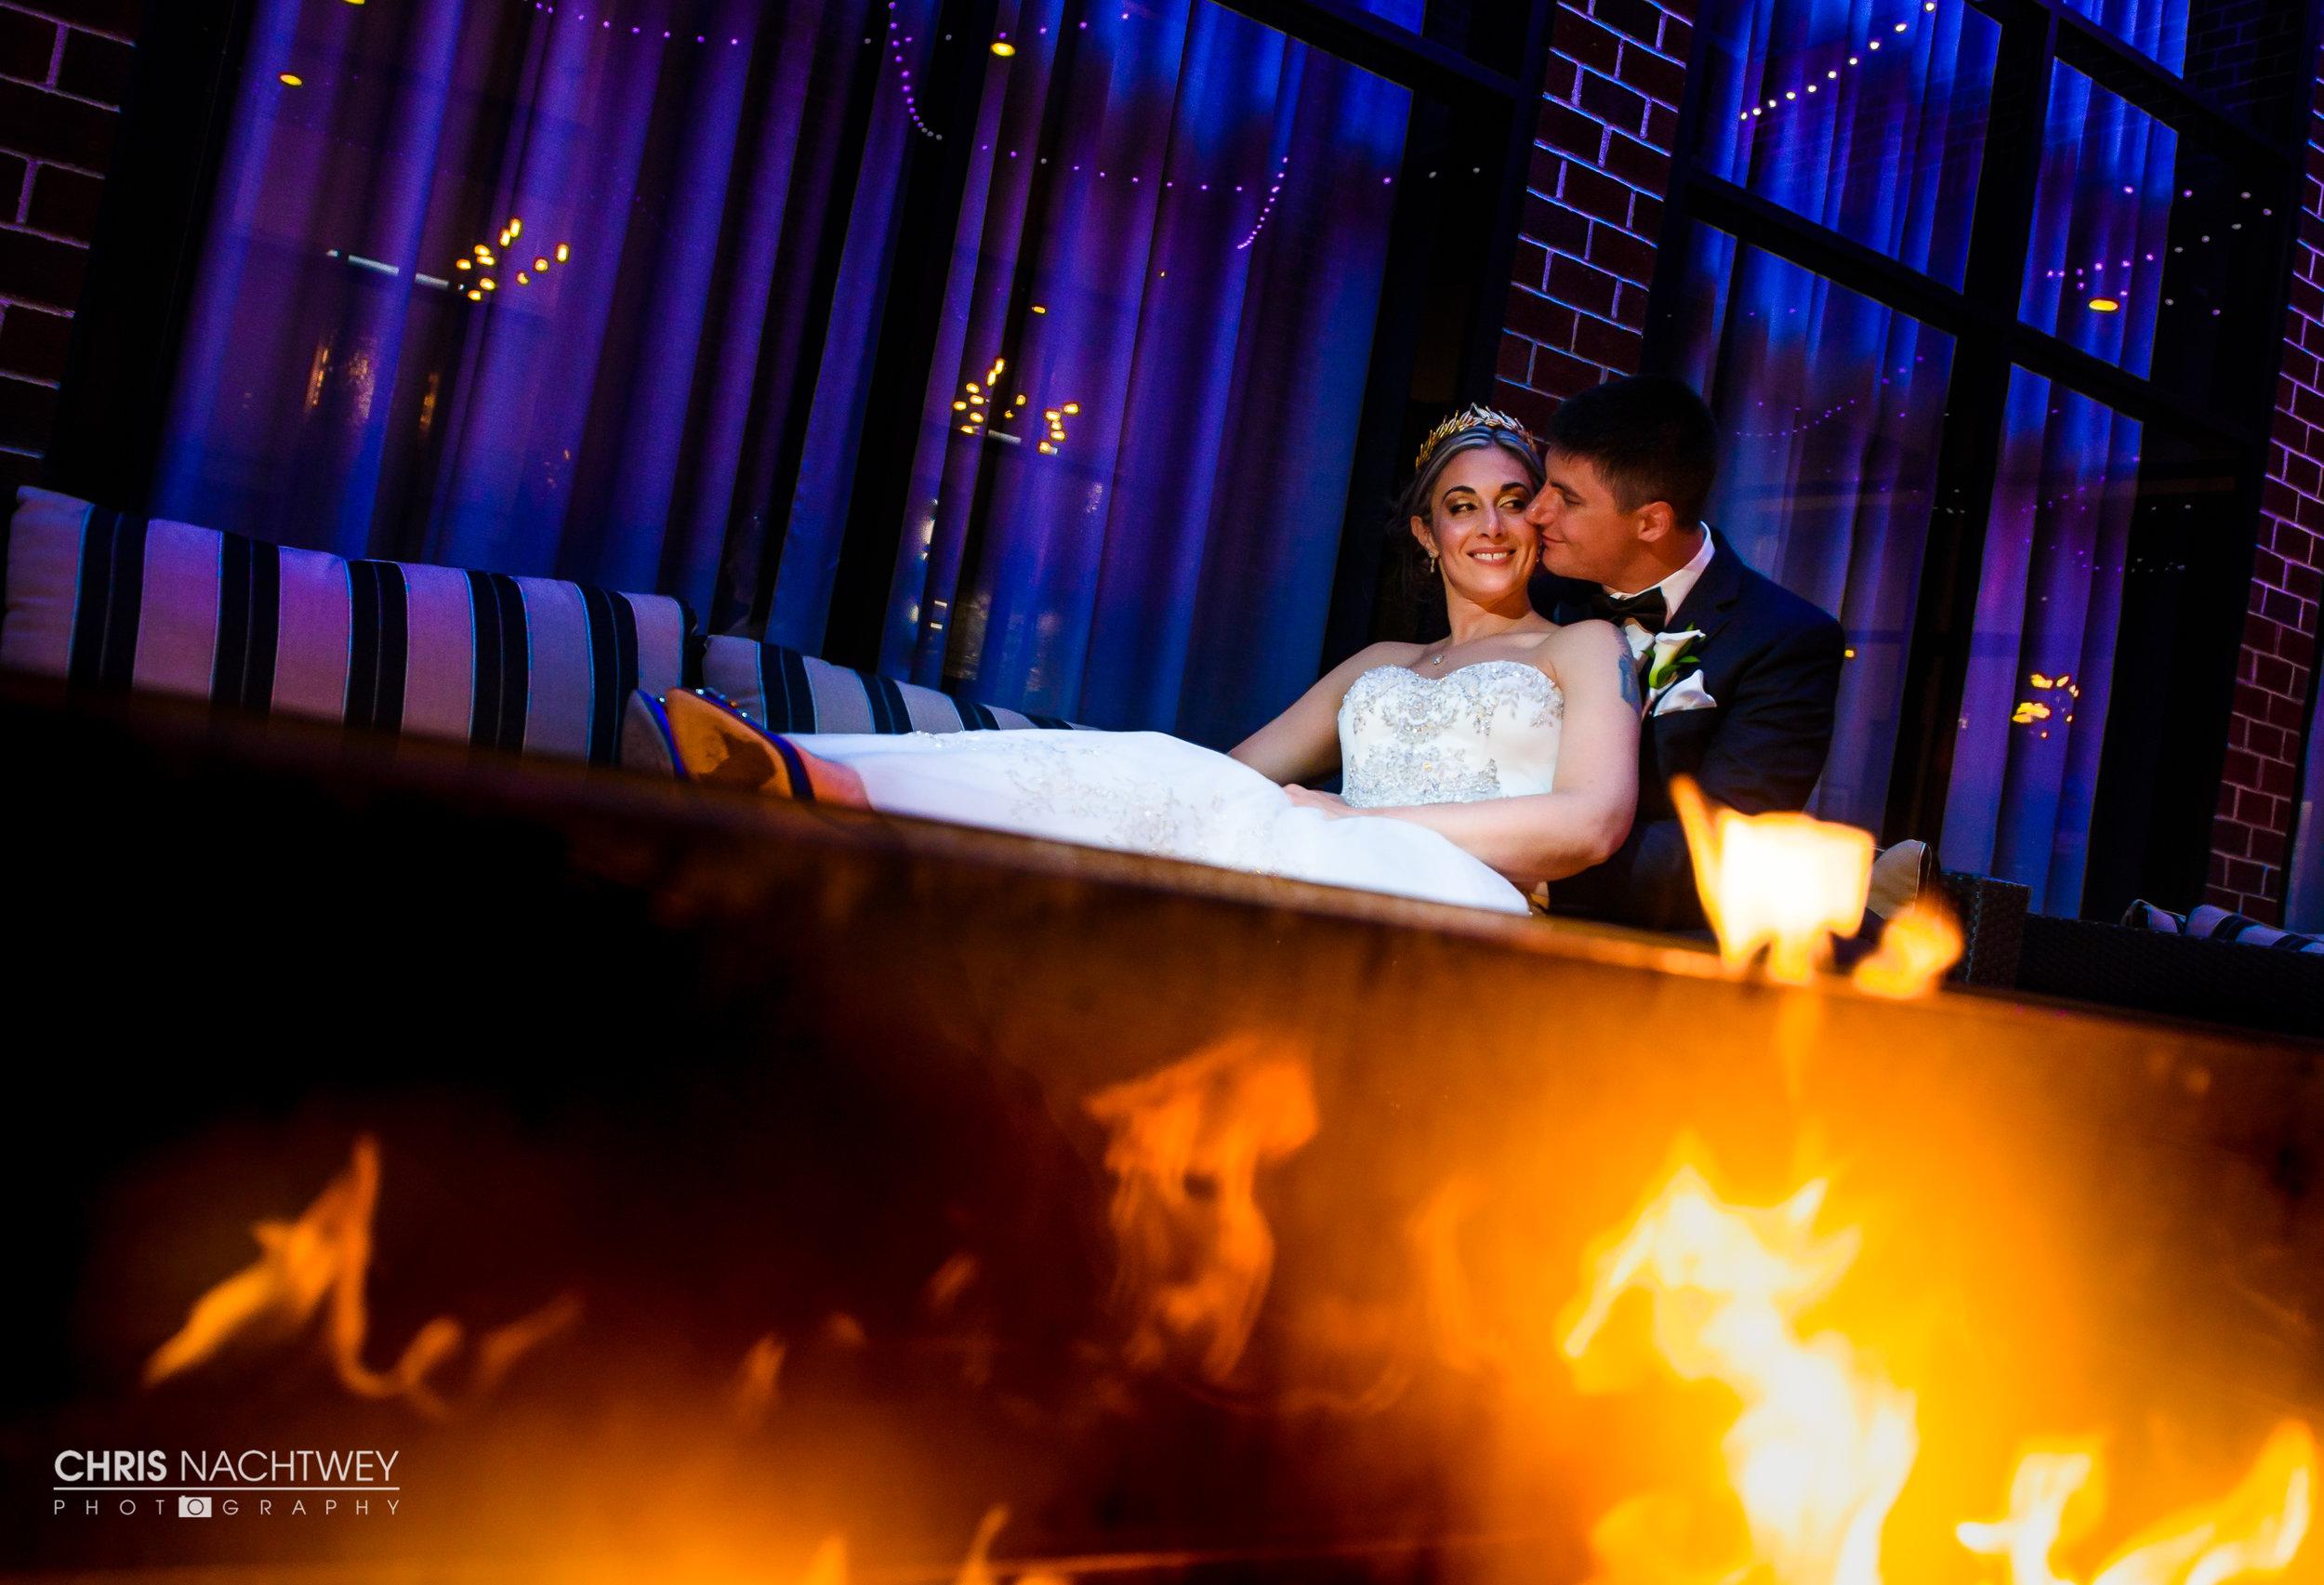 hilton-mystic-connecticut-wedding-photographs-chris-nachtwey-2017.jpg